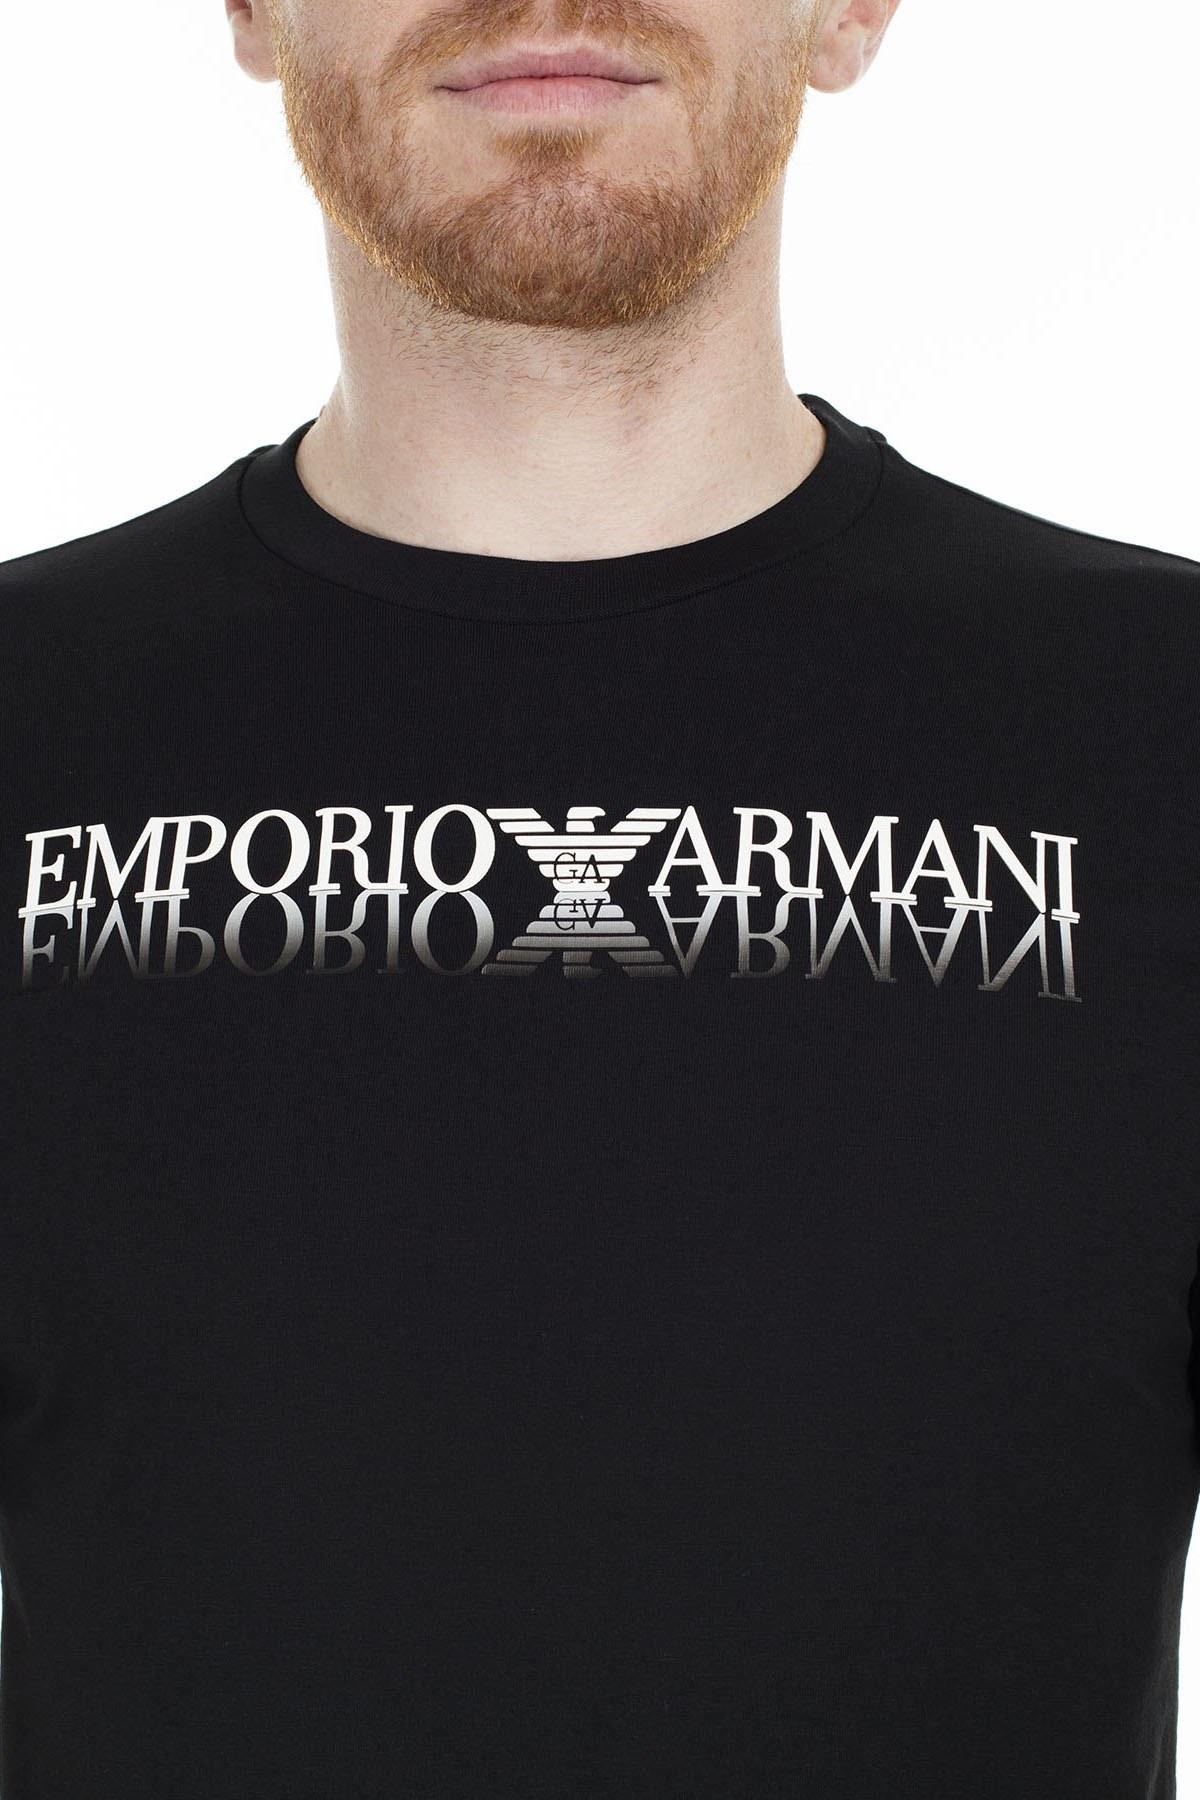 Emporio Armani Regular Fit Erkek T Shirt S 6G1TC3 1J00Z 0999 SİYAH